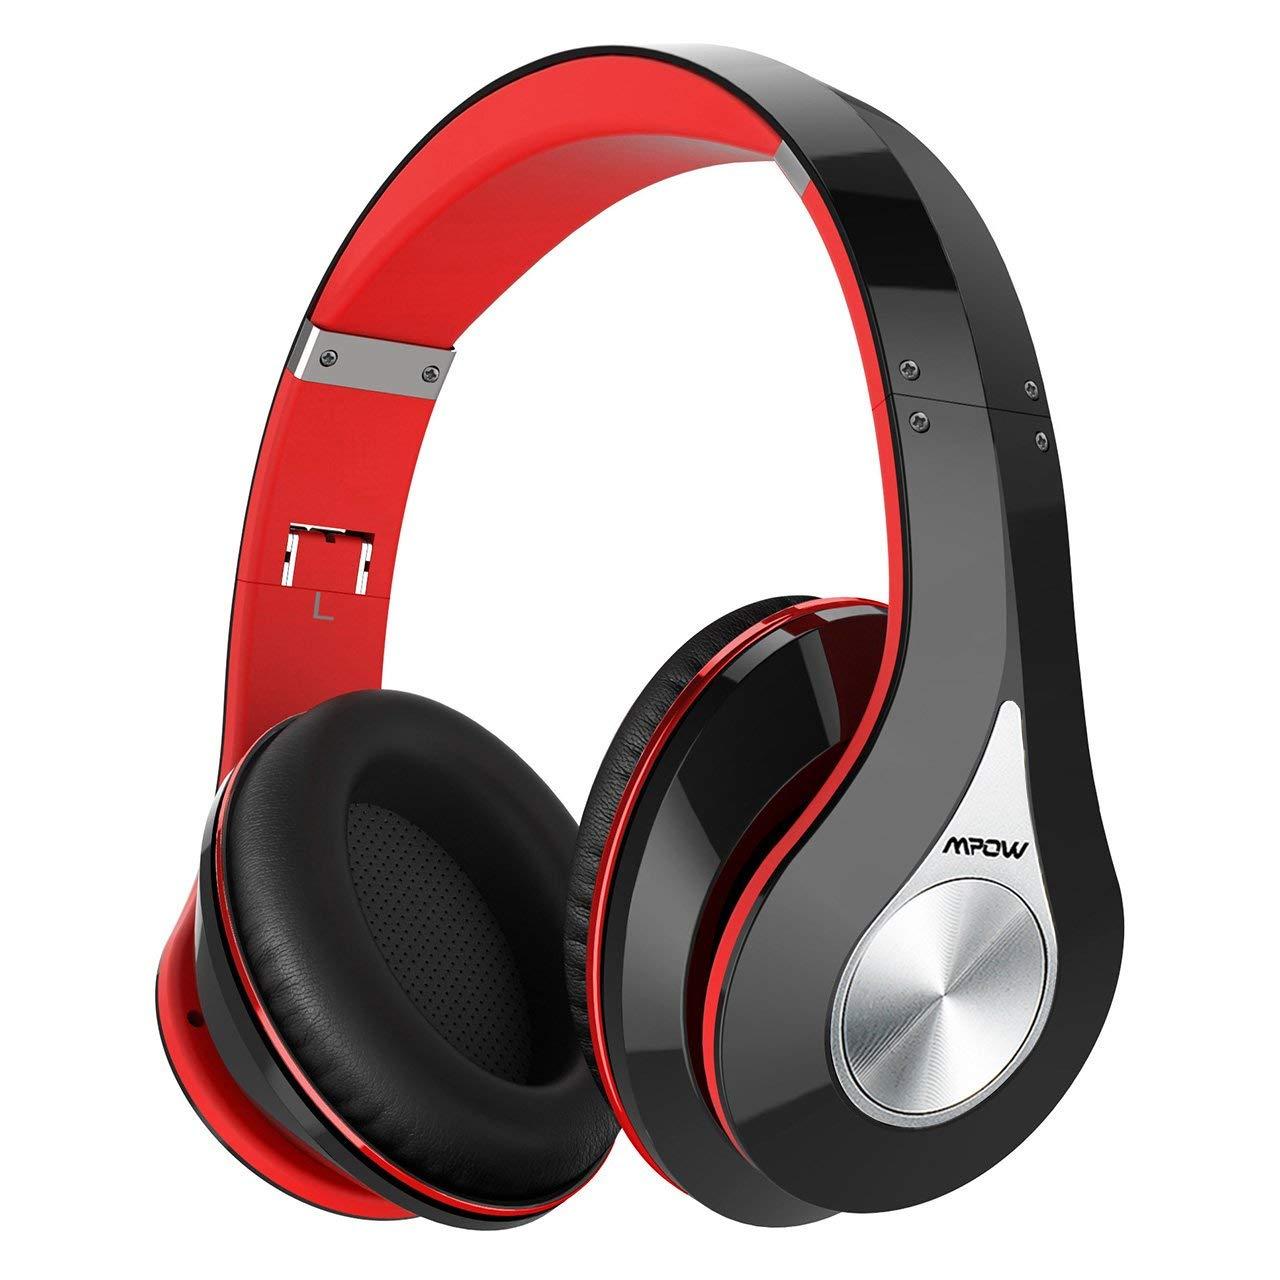 mpow 059 bluetooth wireless headphones